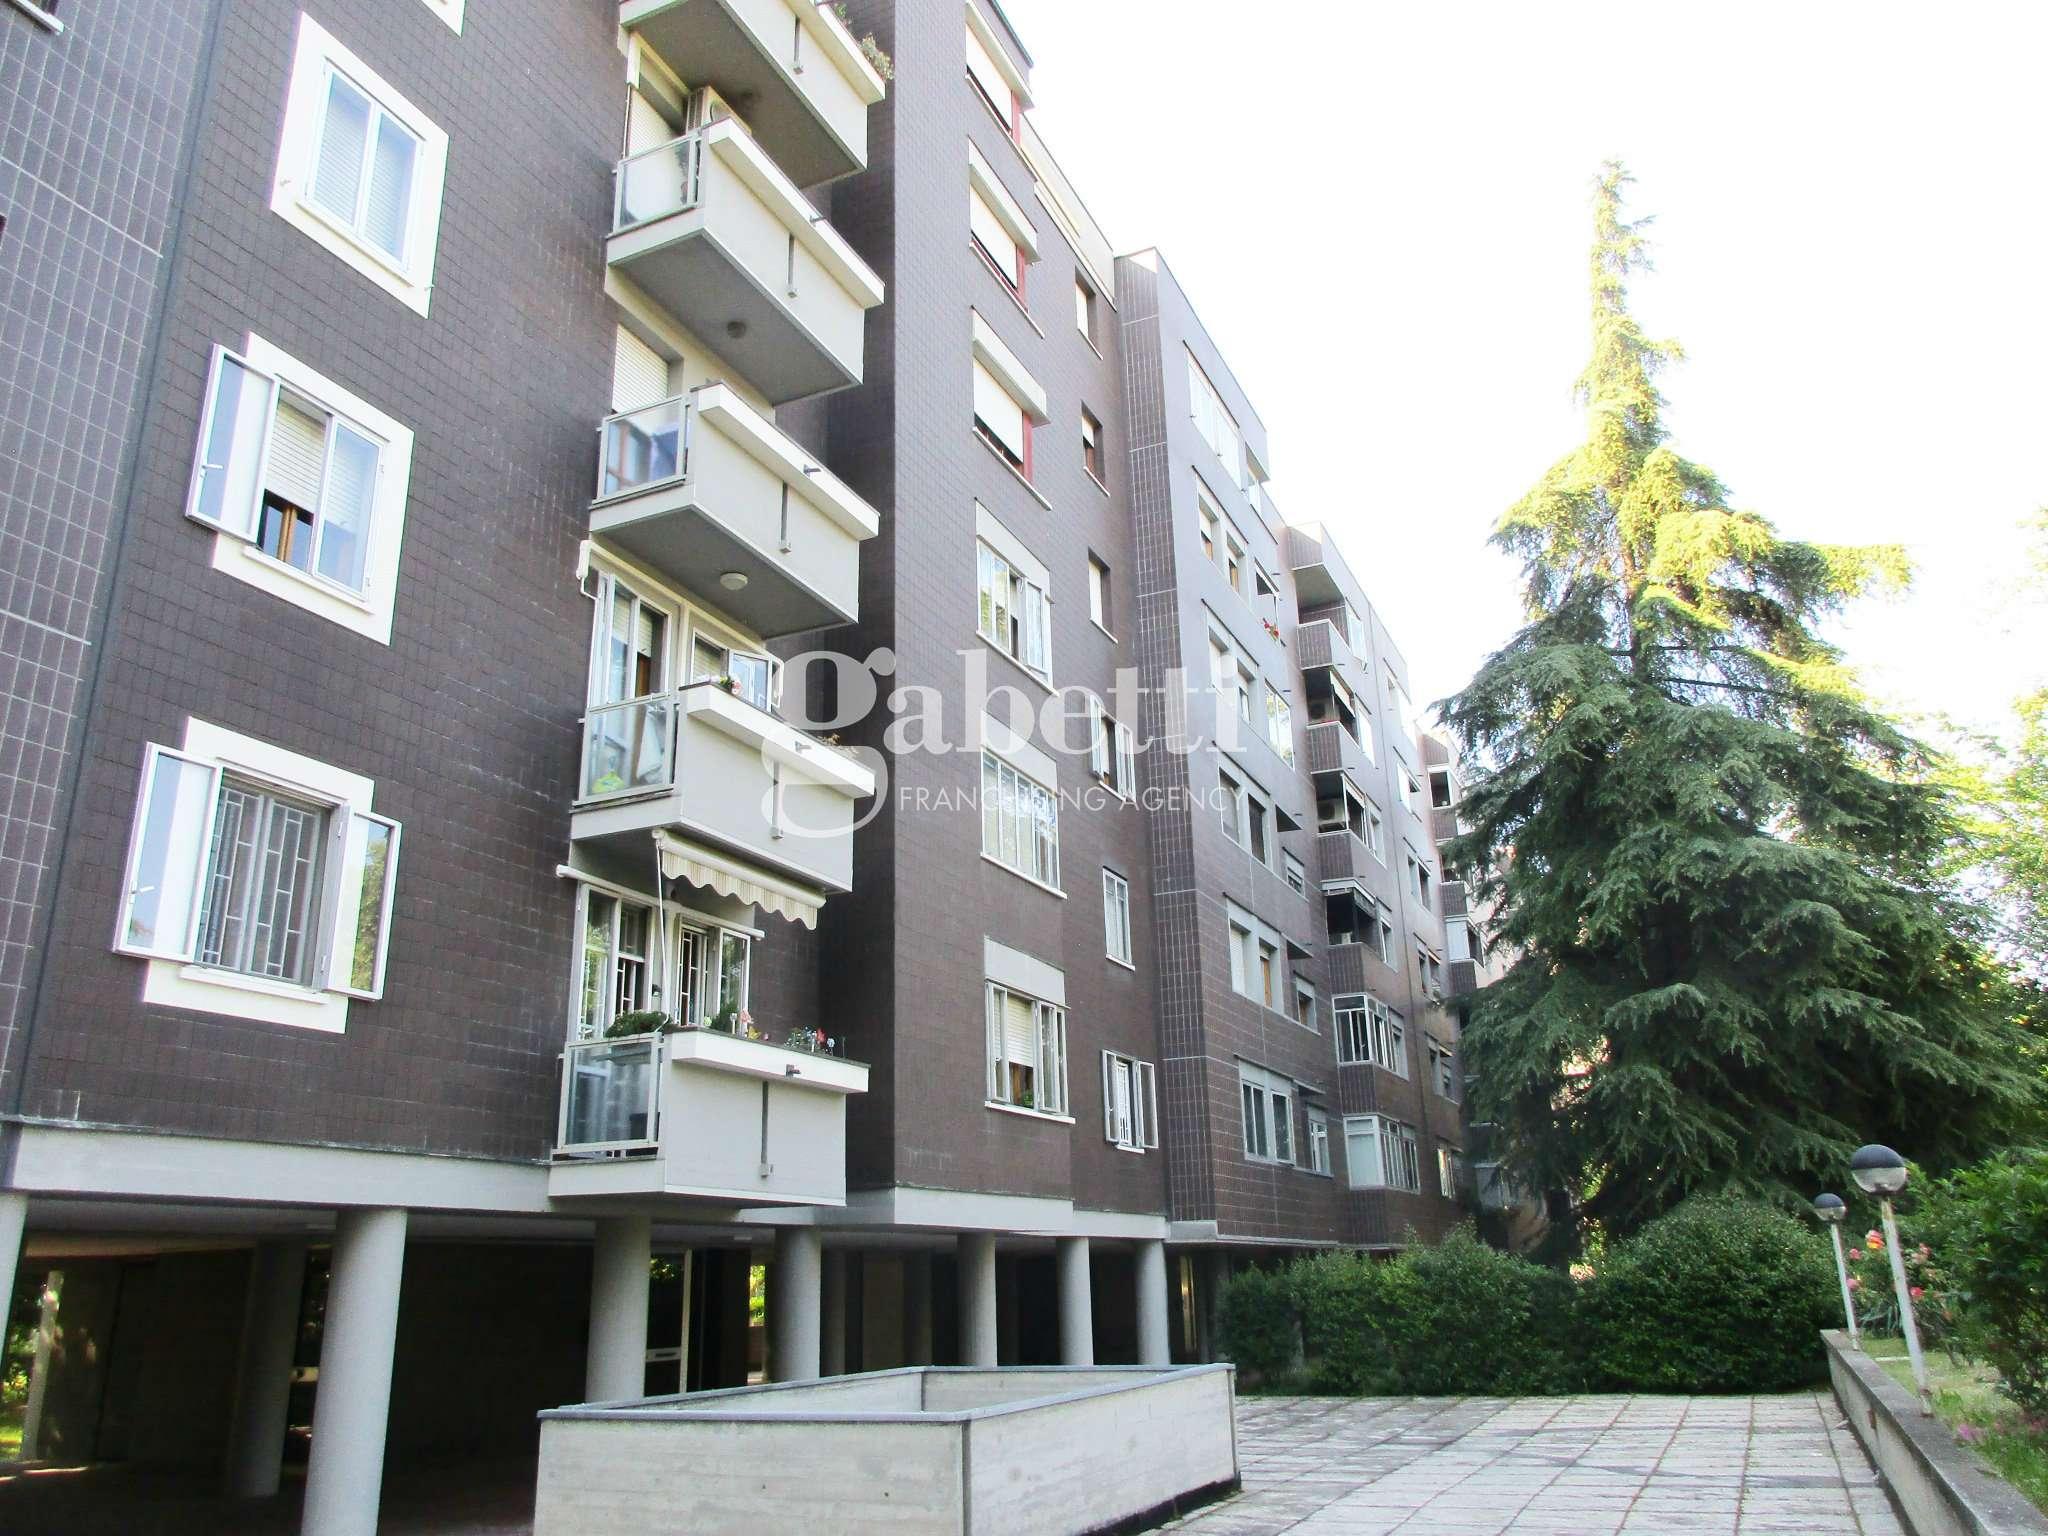 Appartamento in vendita 5 vani 110 mq.  via Misa Bologna